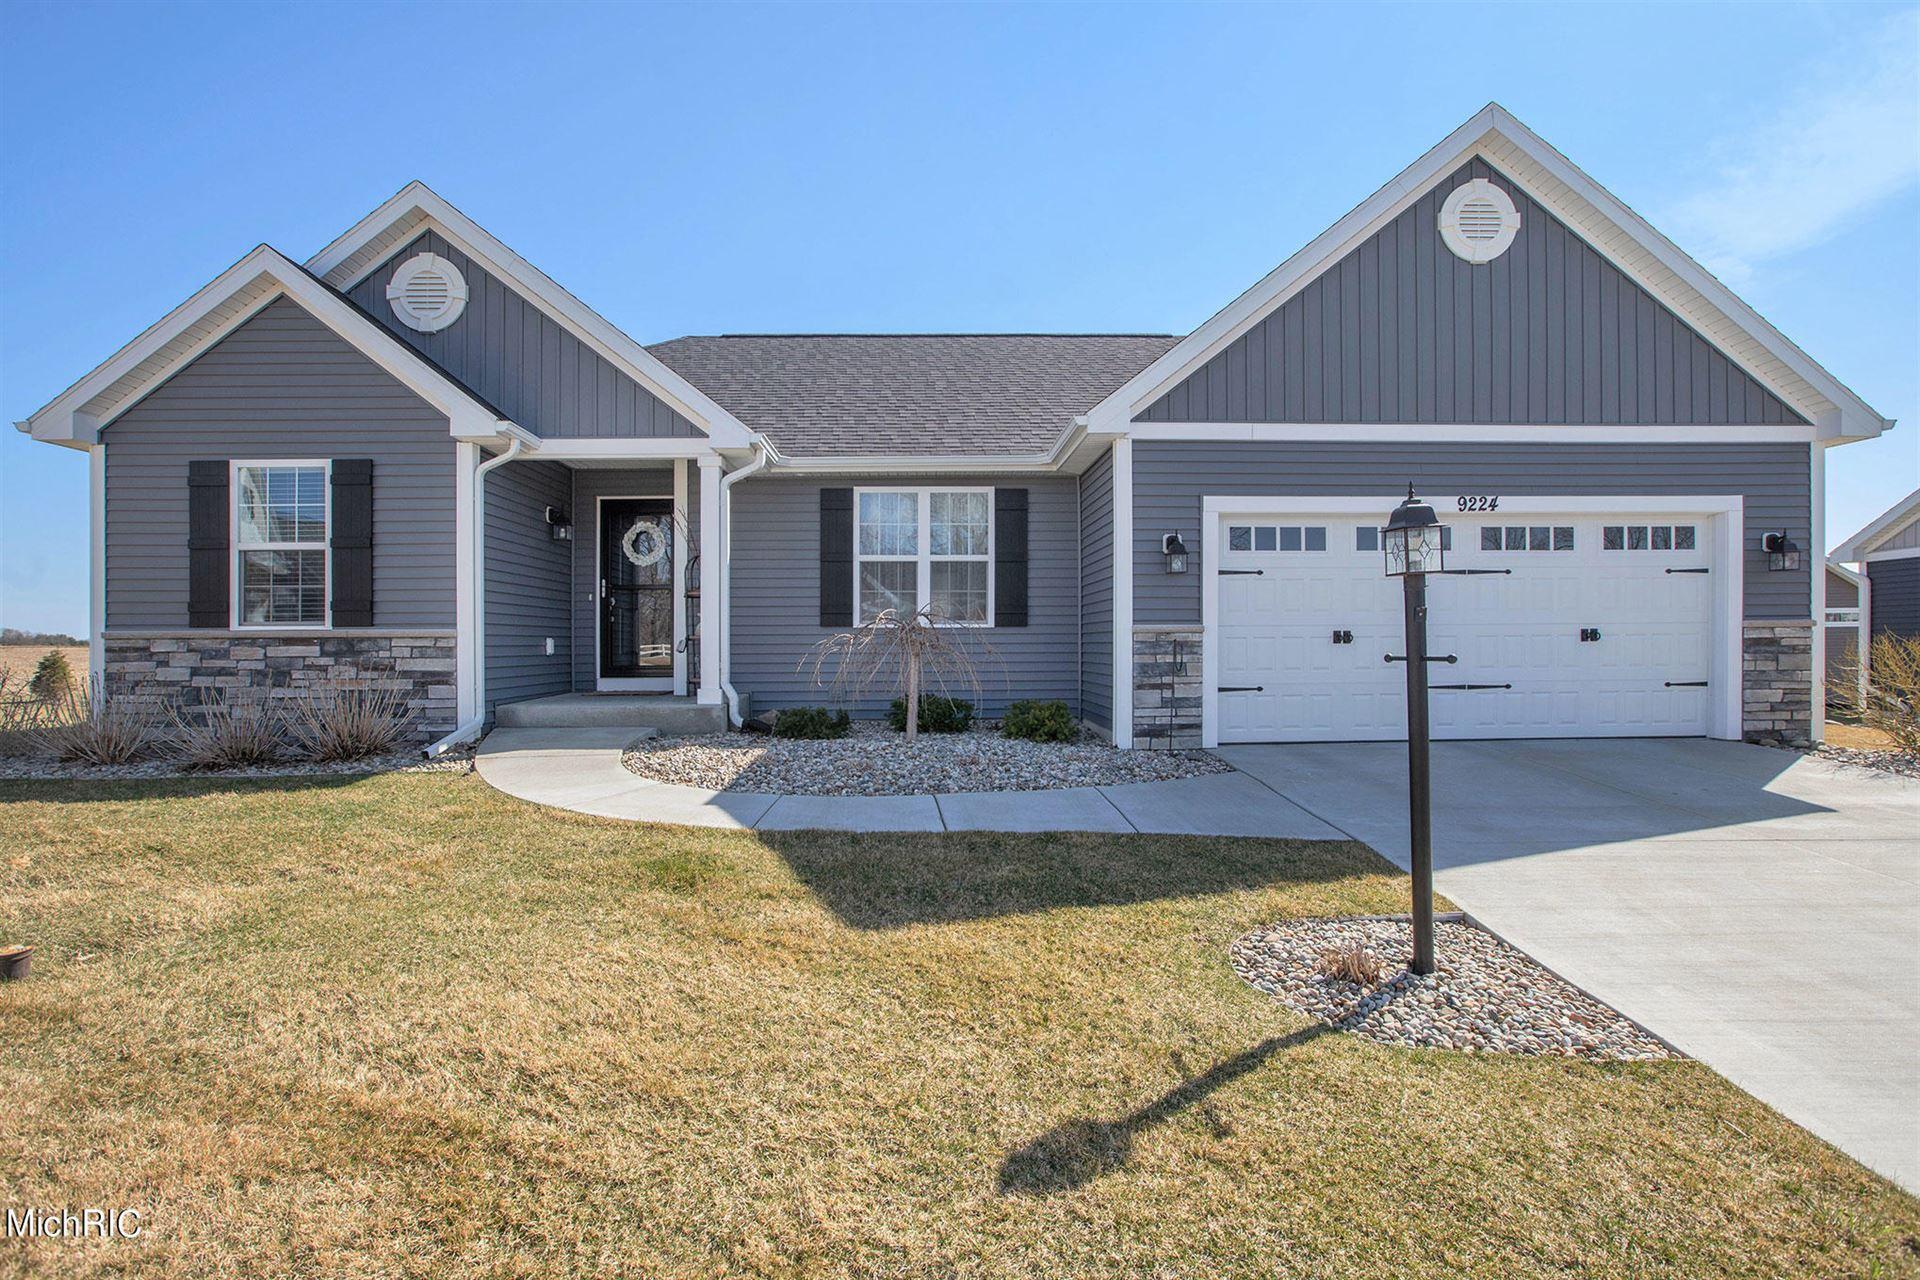 9224 Cottage Glen, Vicksburg, MI 49083 - MLS#: 21010845